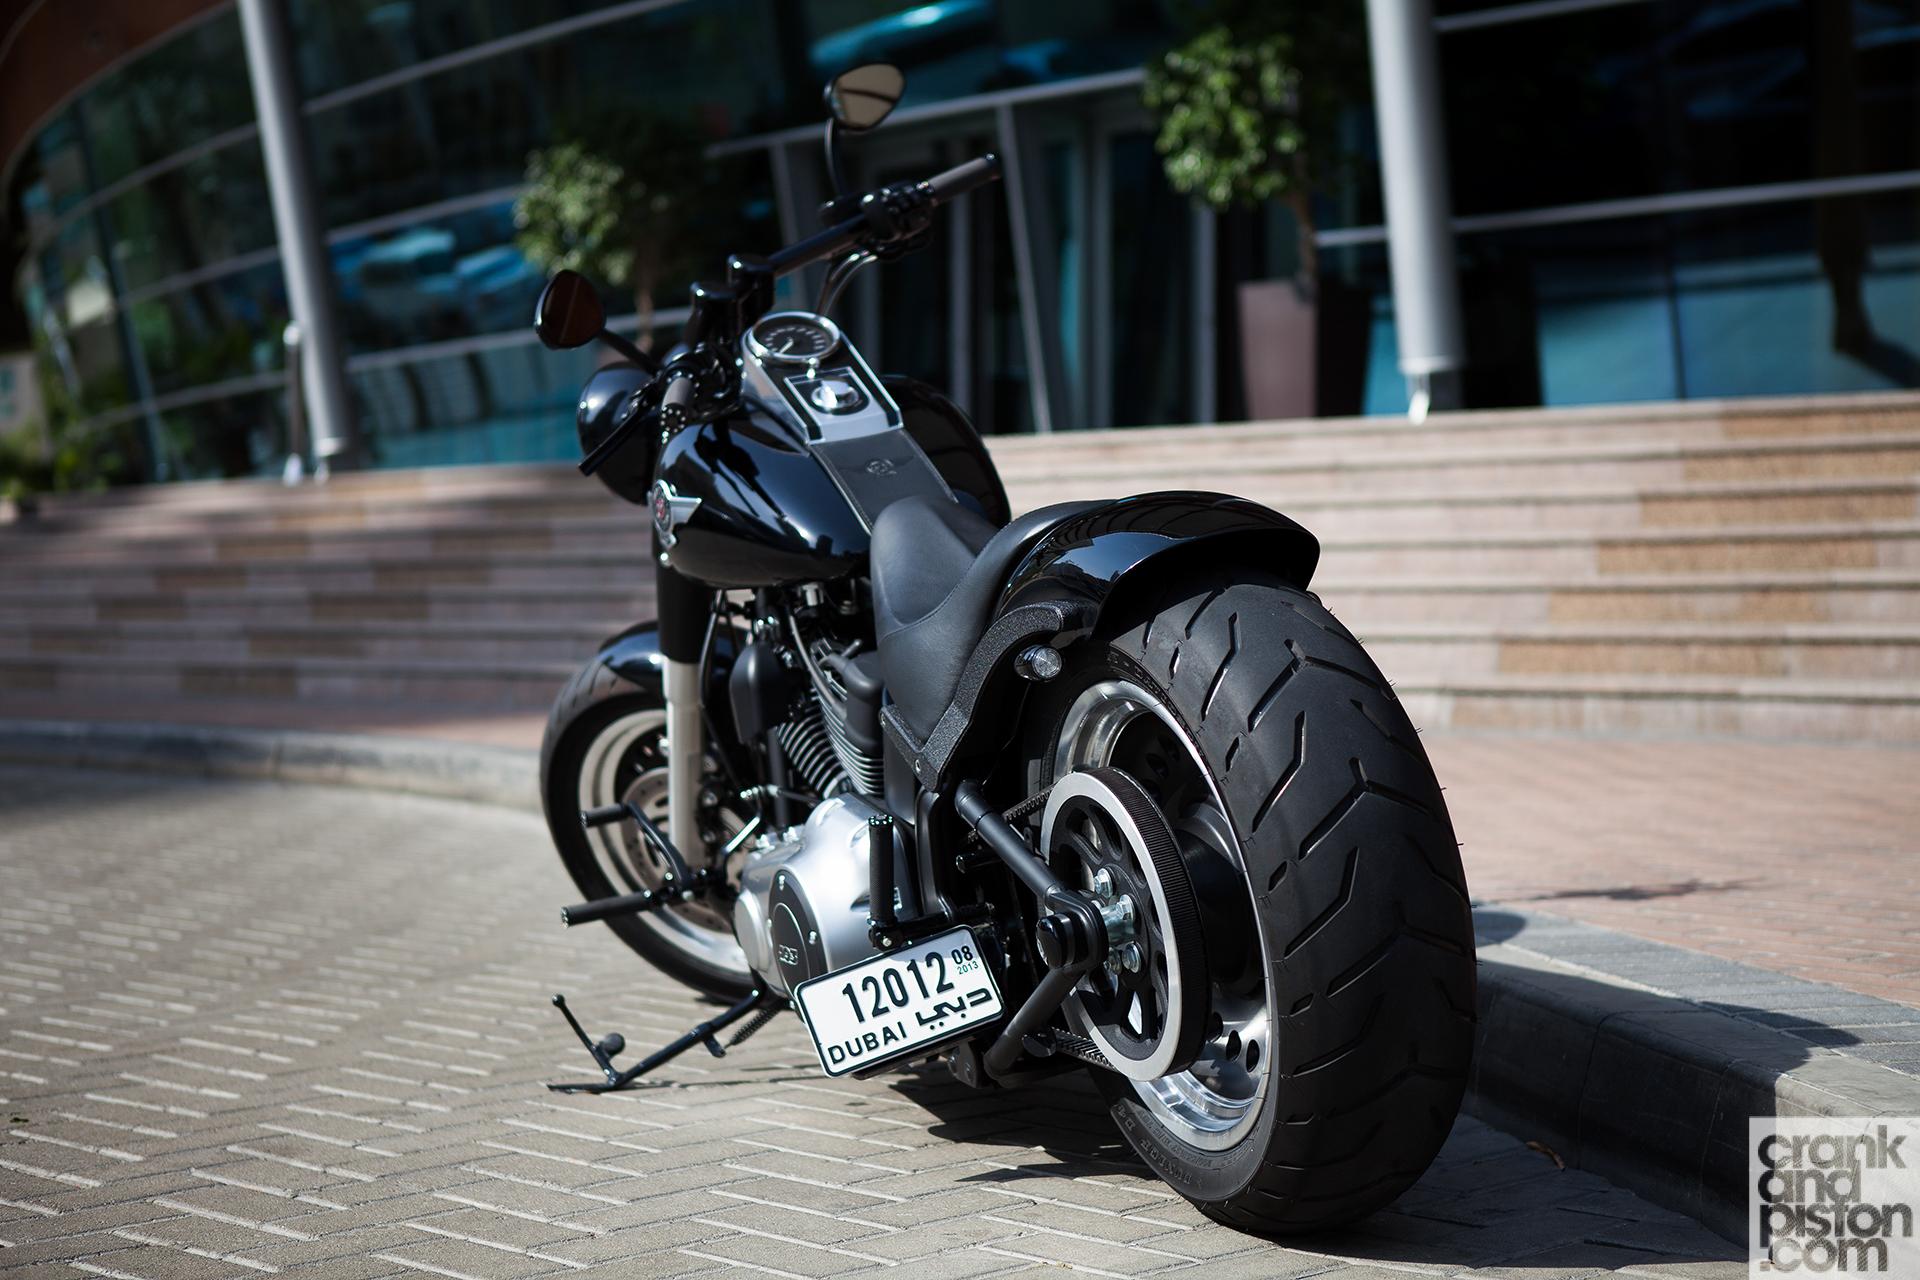 Harley Davidson Fat Boy Dubai Uae Wallpaper 003 Crankandpiston Com